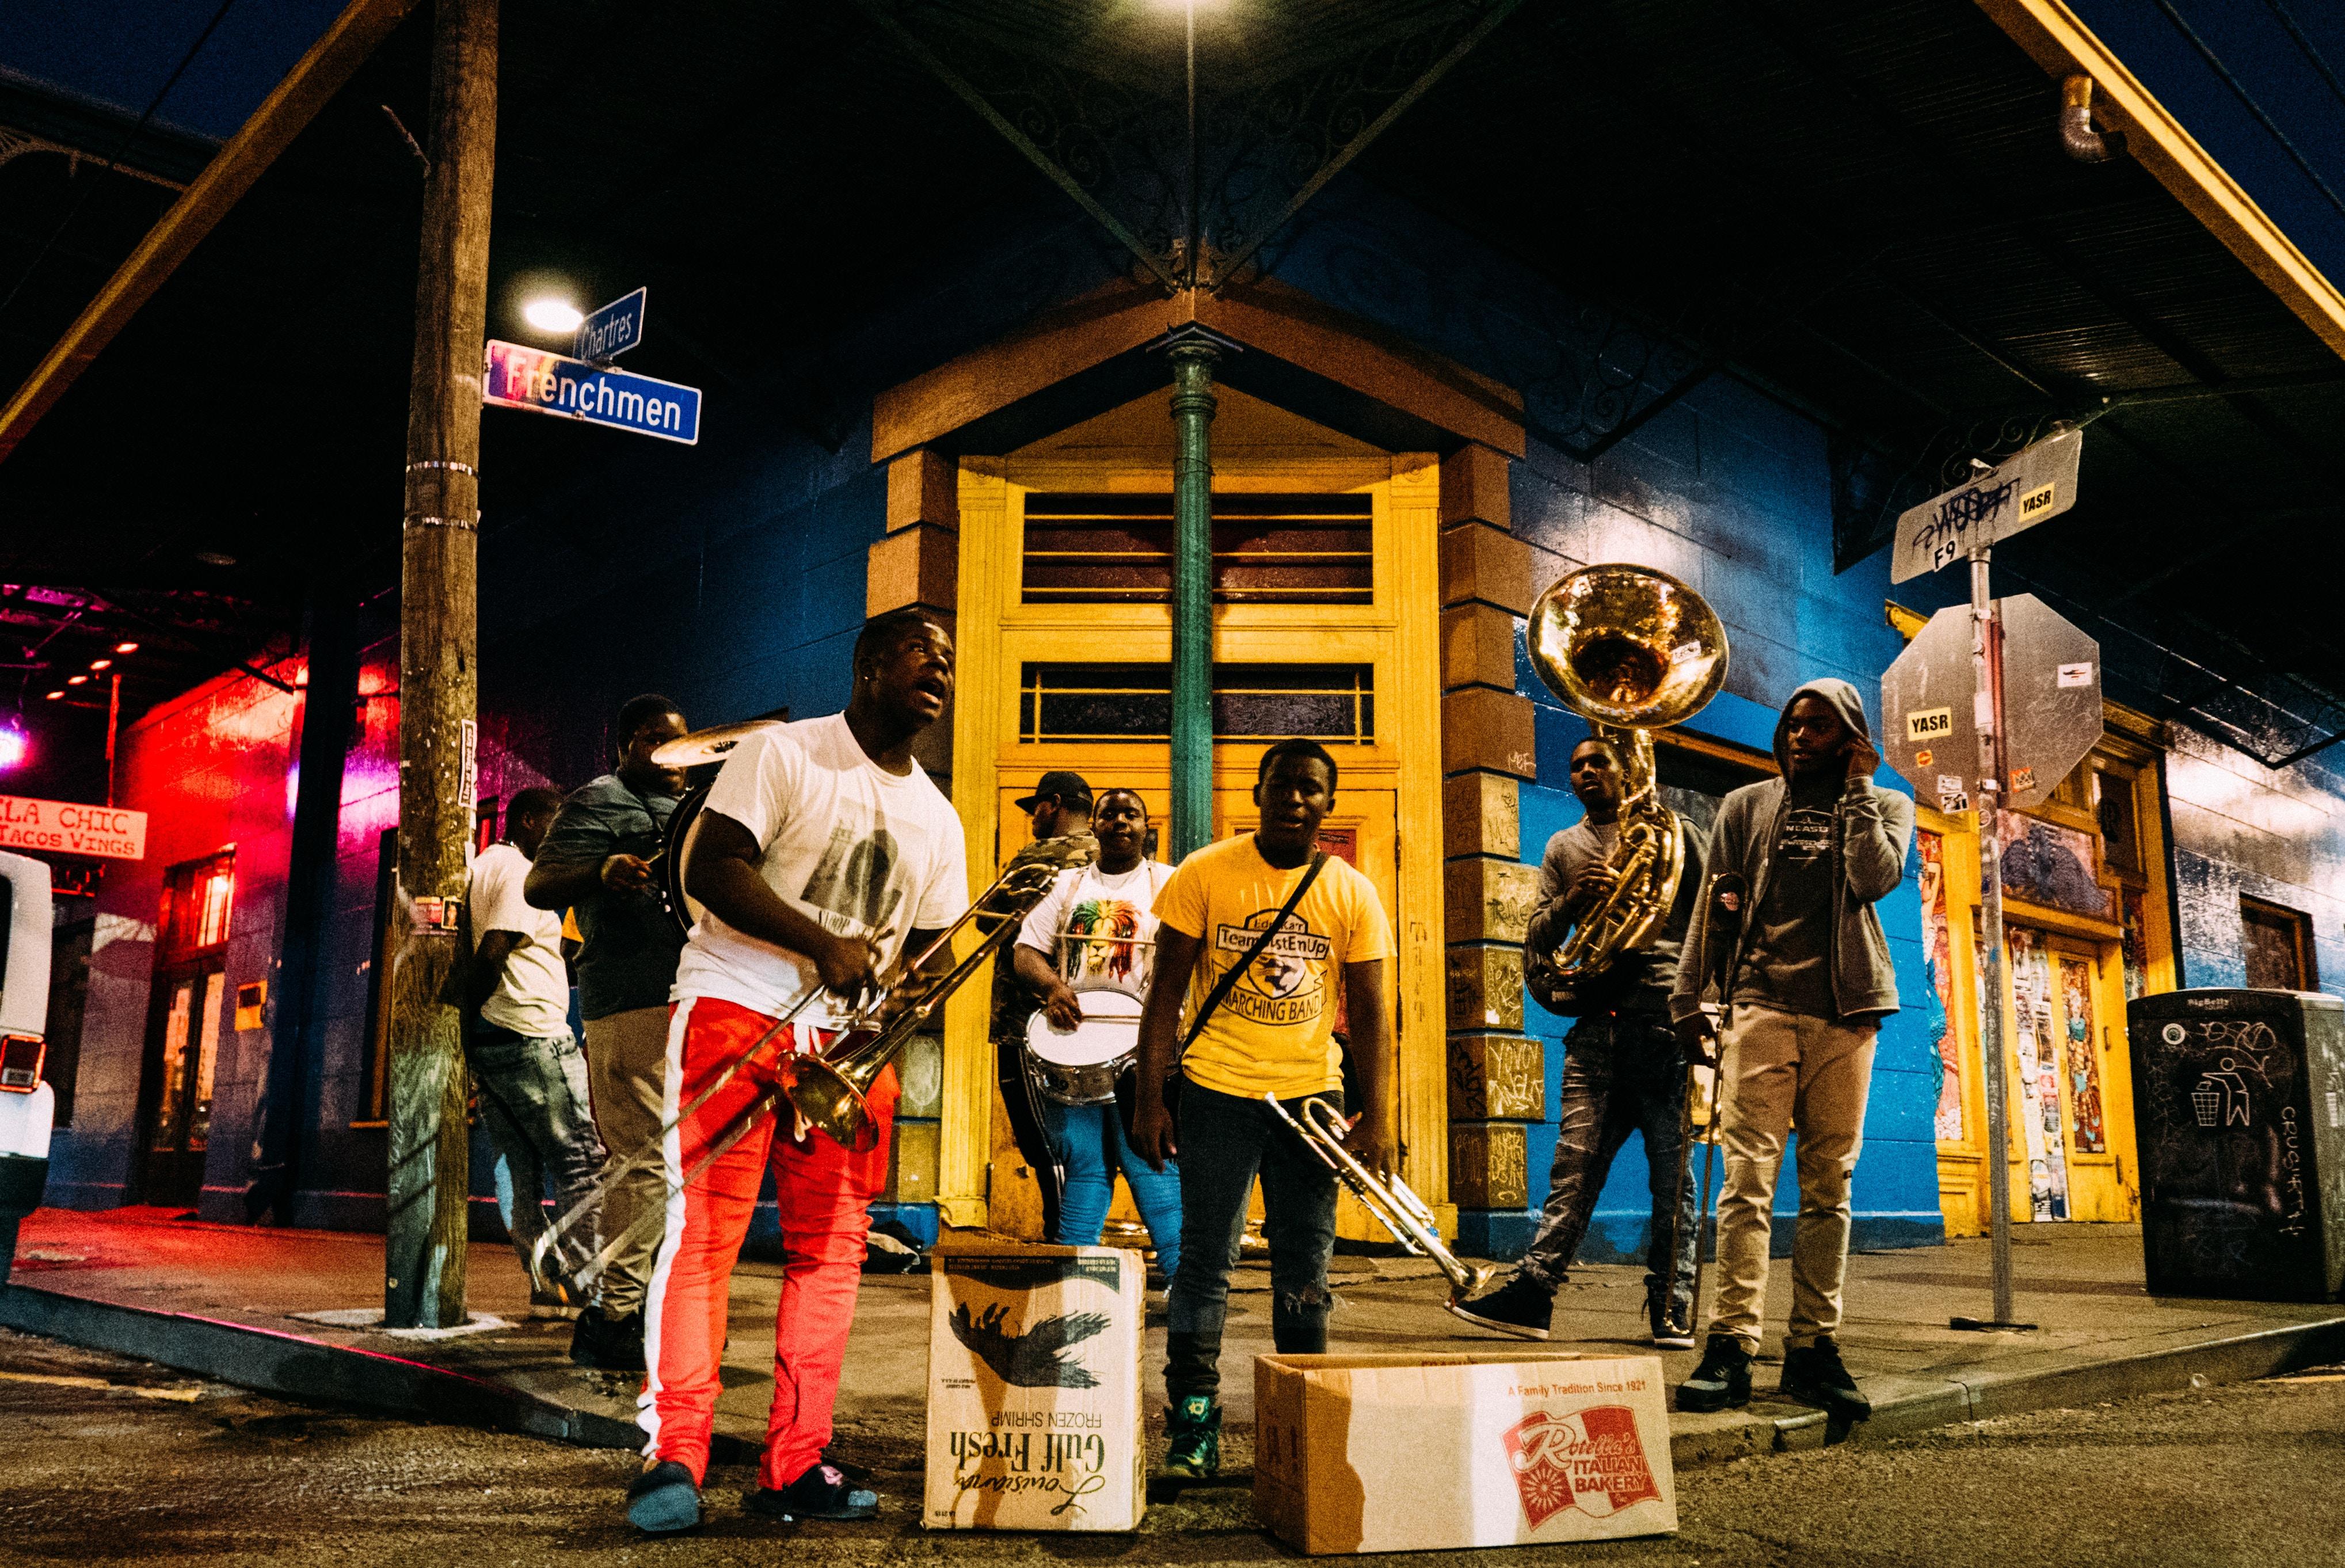 Músicos Em Frenchmen Street, New Orleans, Estados Unidos. Foto: Robson Hatsukami Morgan / Unsplash.